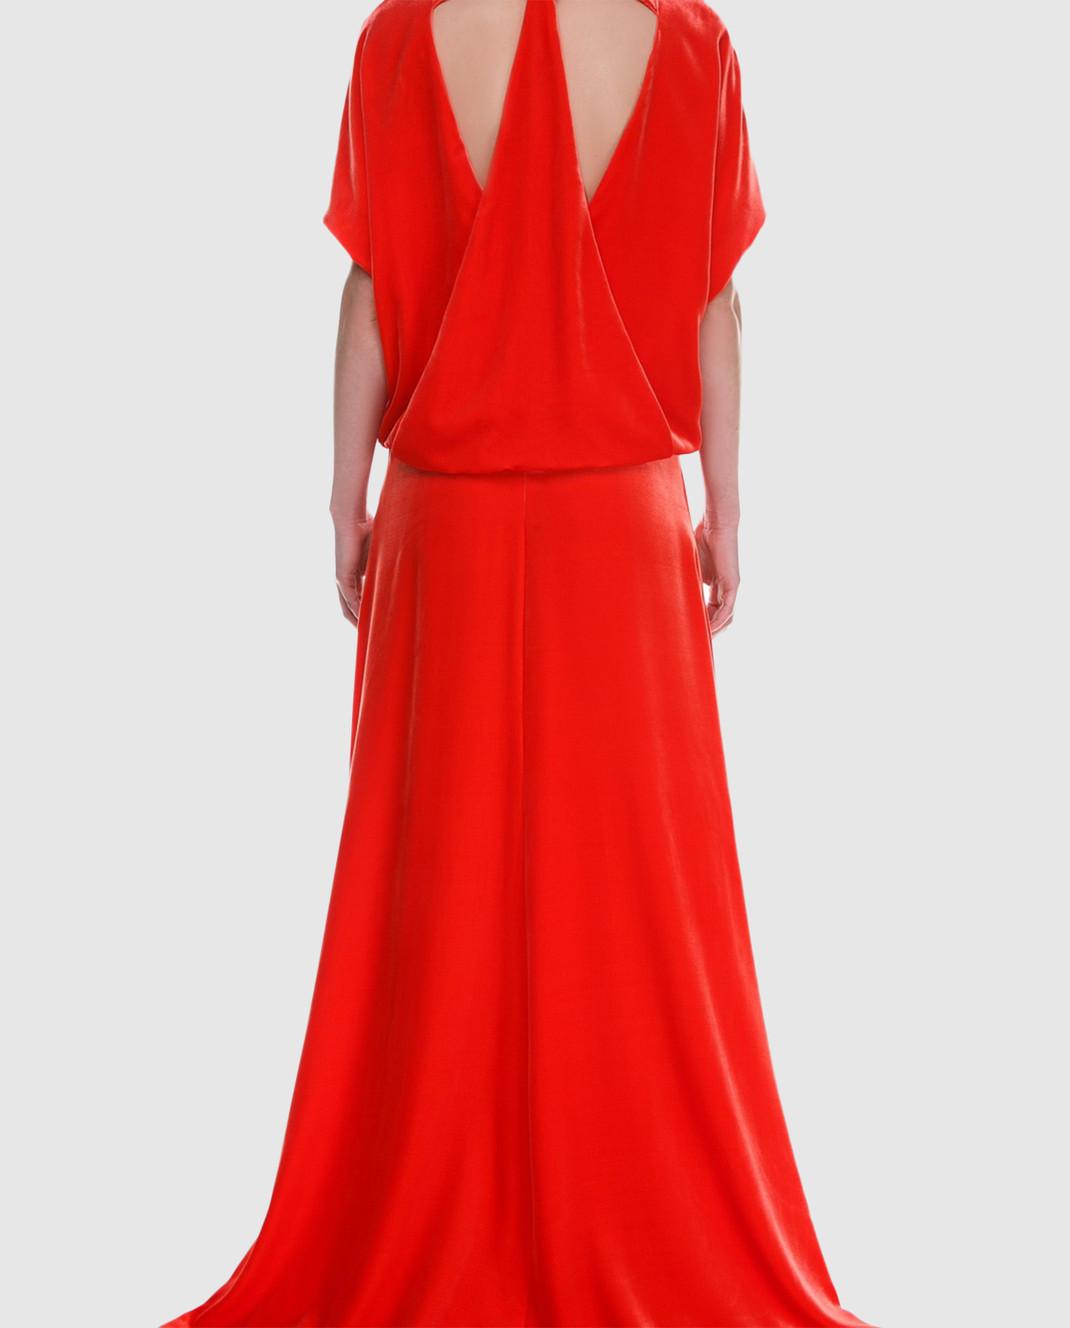 Valentino Красное платье PB0VD7E53TF изображение 4